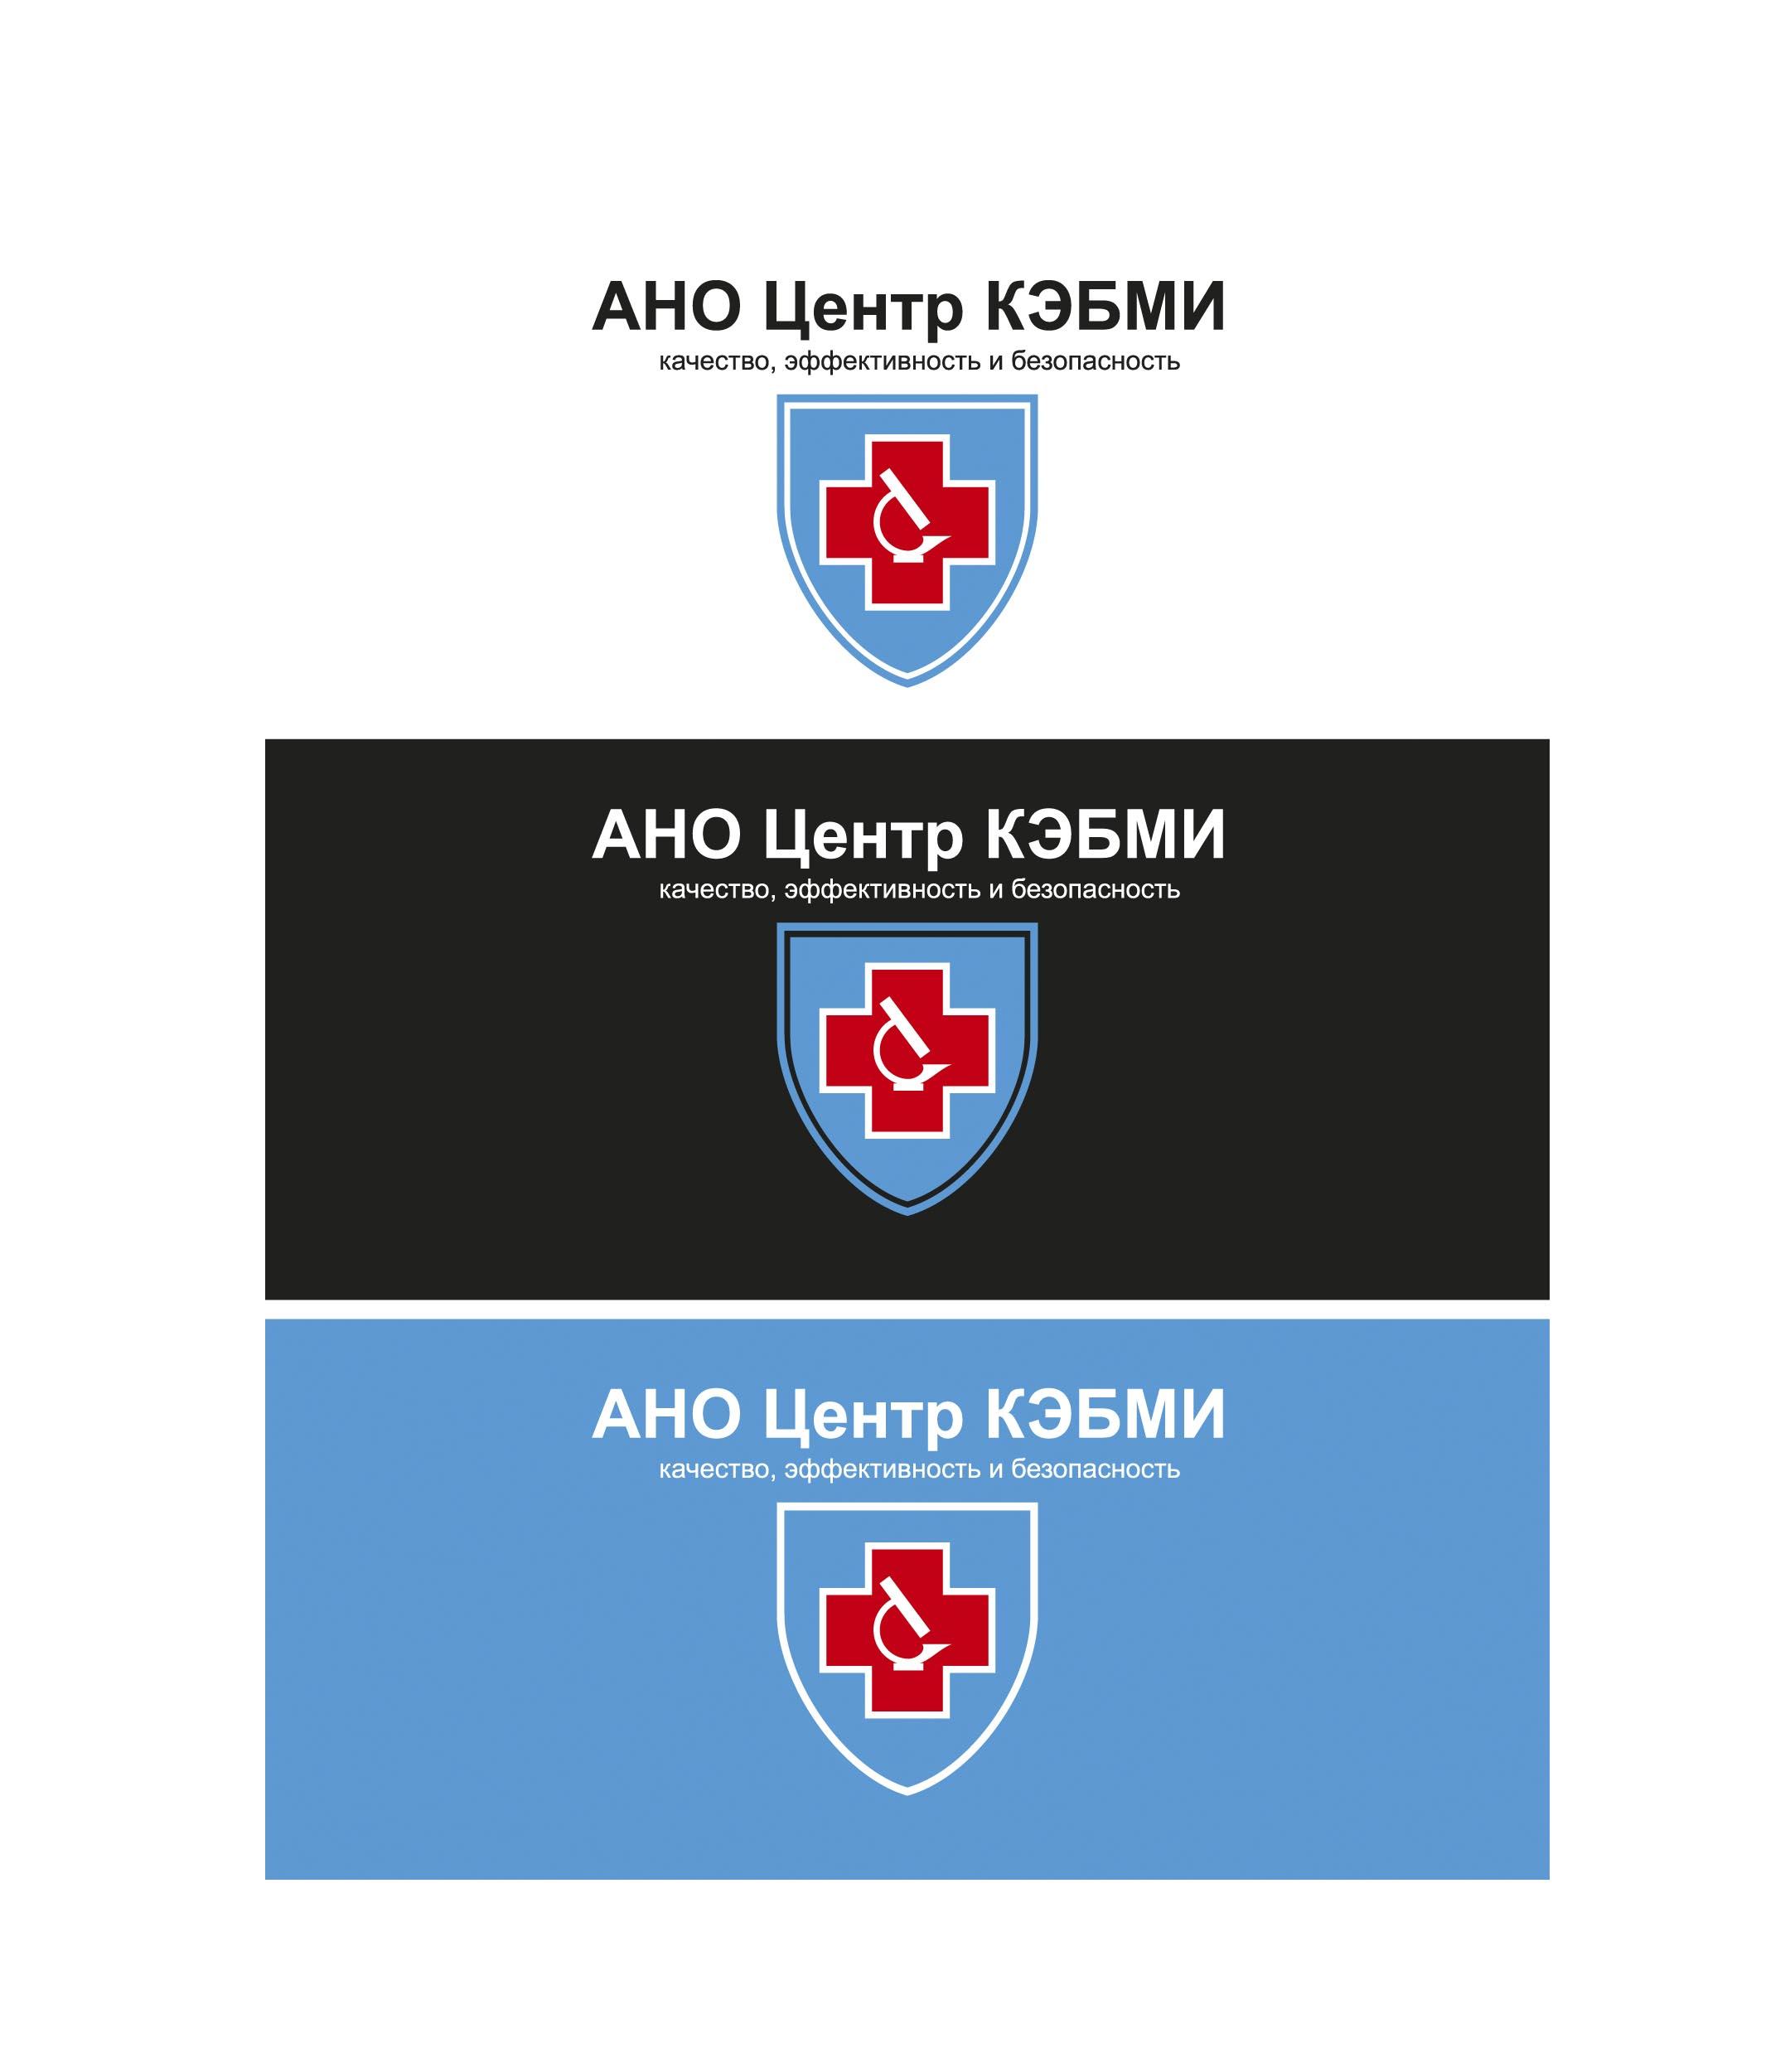 Редизайн логотипа АНО Центр КЭБМИ - BREVIS фото f_5475b1b804584b2e.jpg